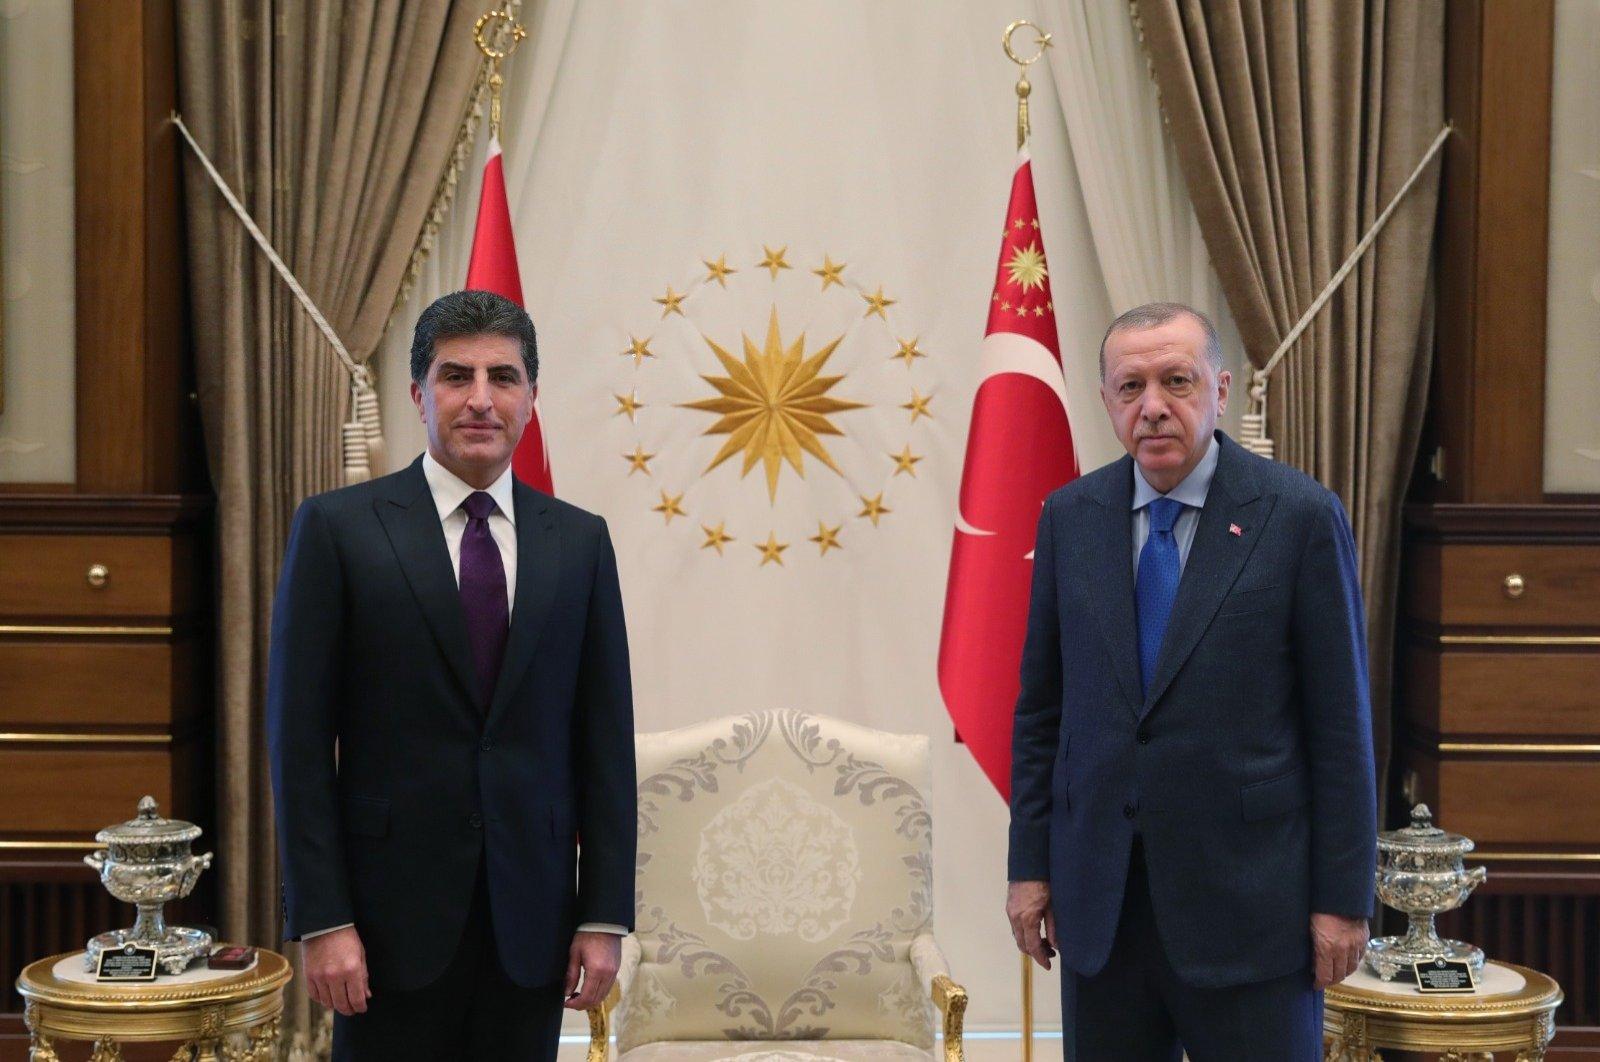 President Recep Tayyip Erdoğan receives Nechirvan Barzani, the leader of Iraq's Kurdistan Regional Government (KRG), in the capital Ankara, Turkey, Sept. 3, 2020. (DHA)